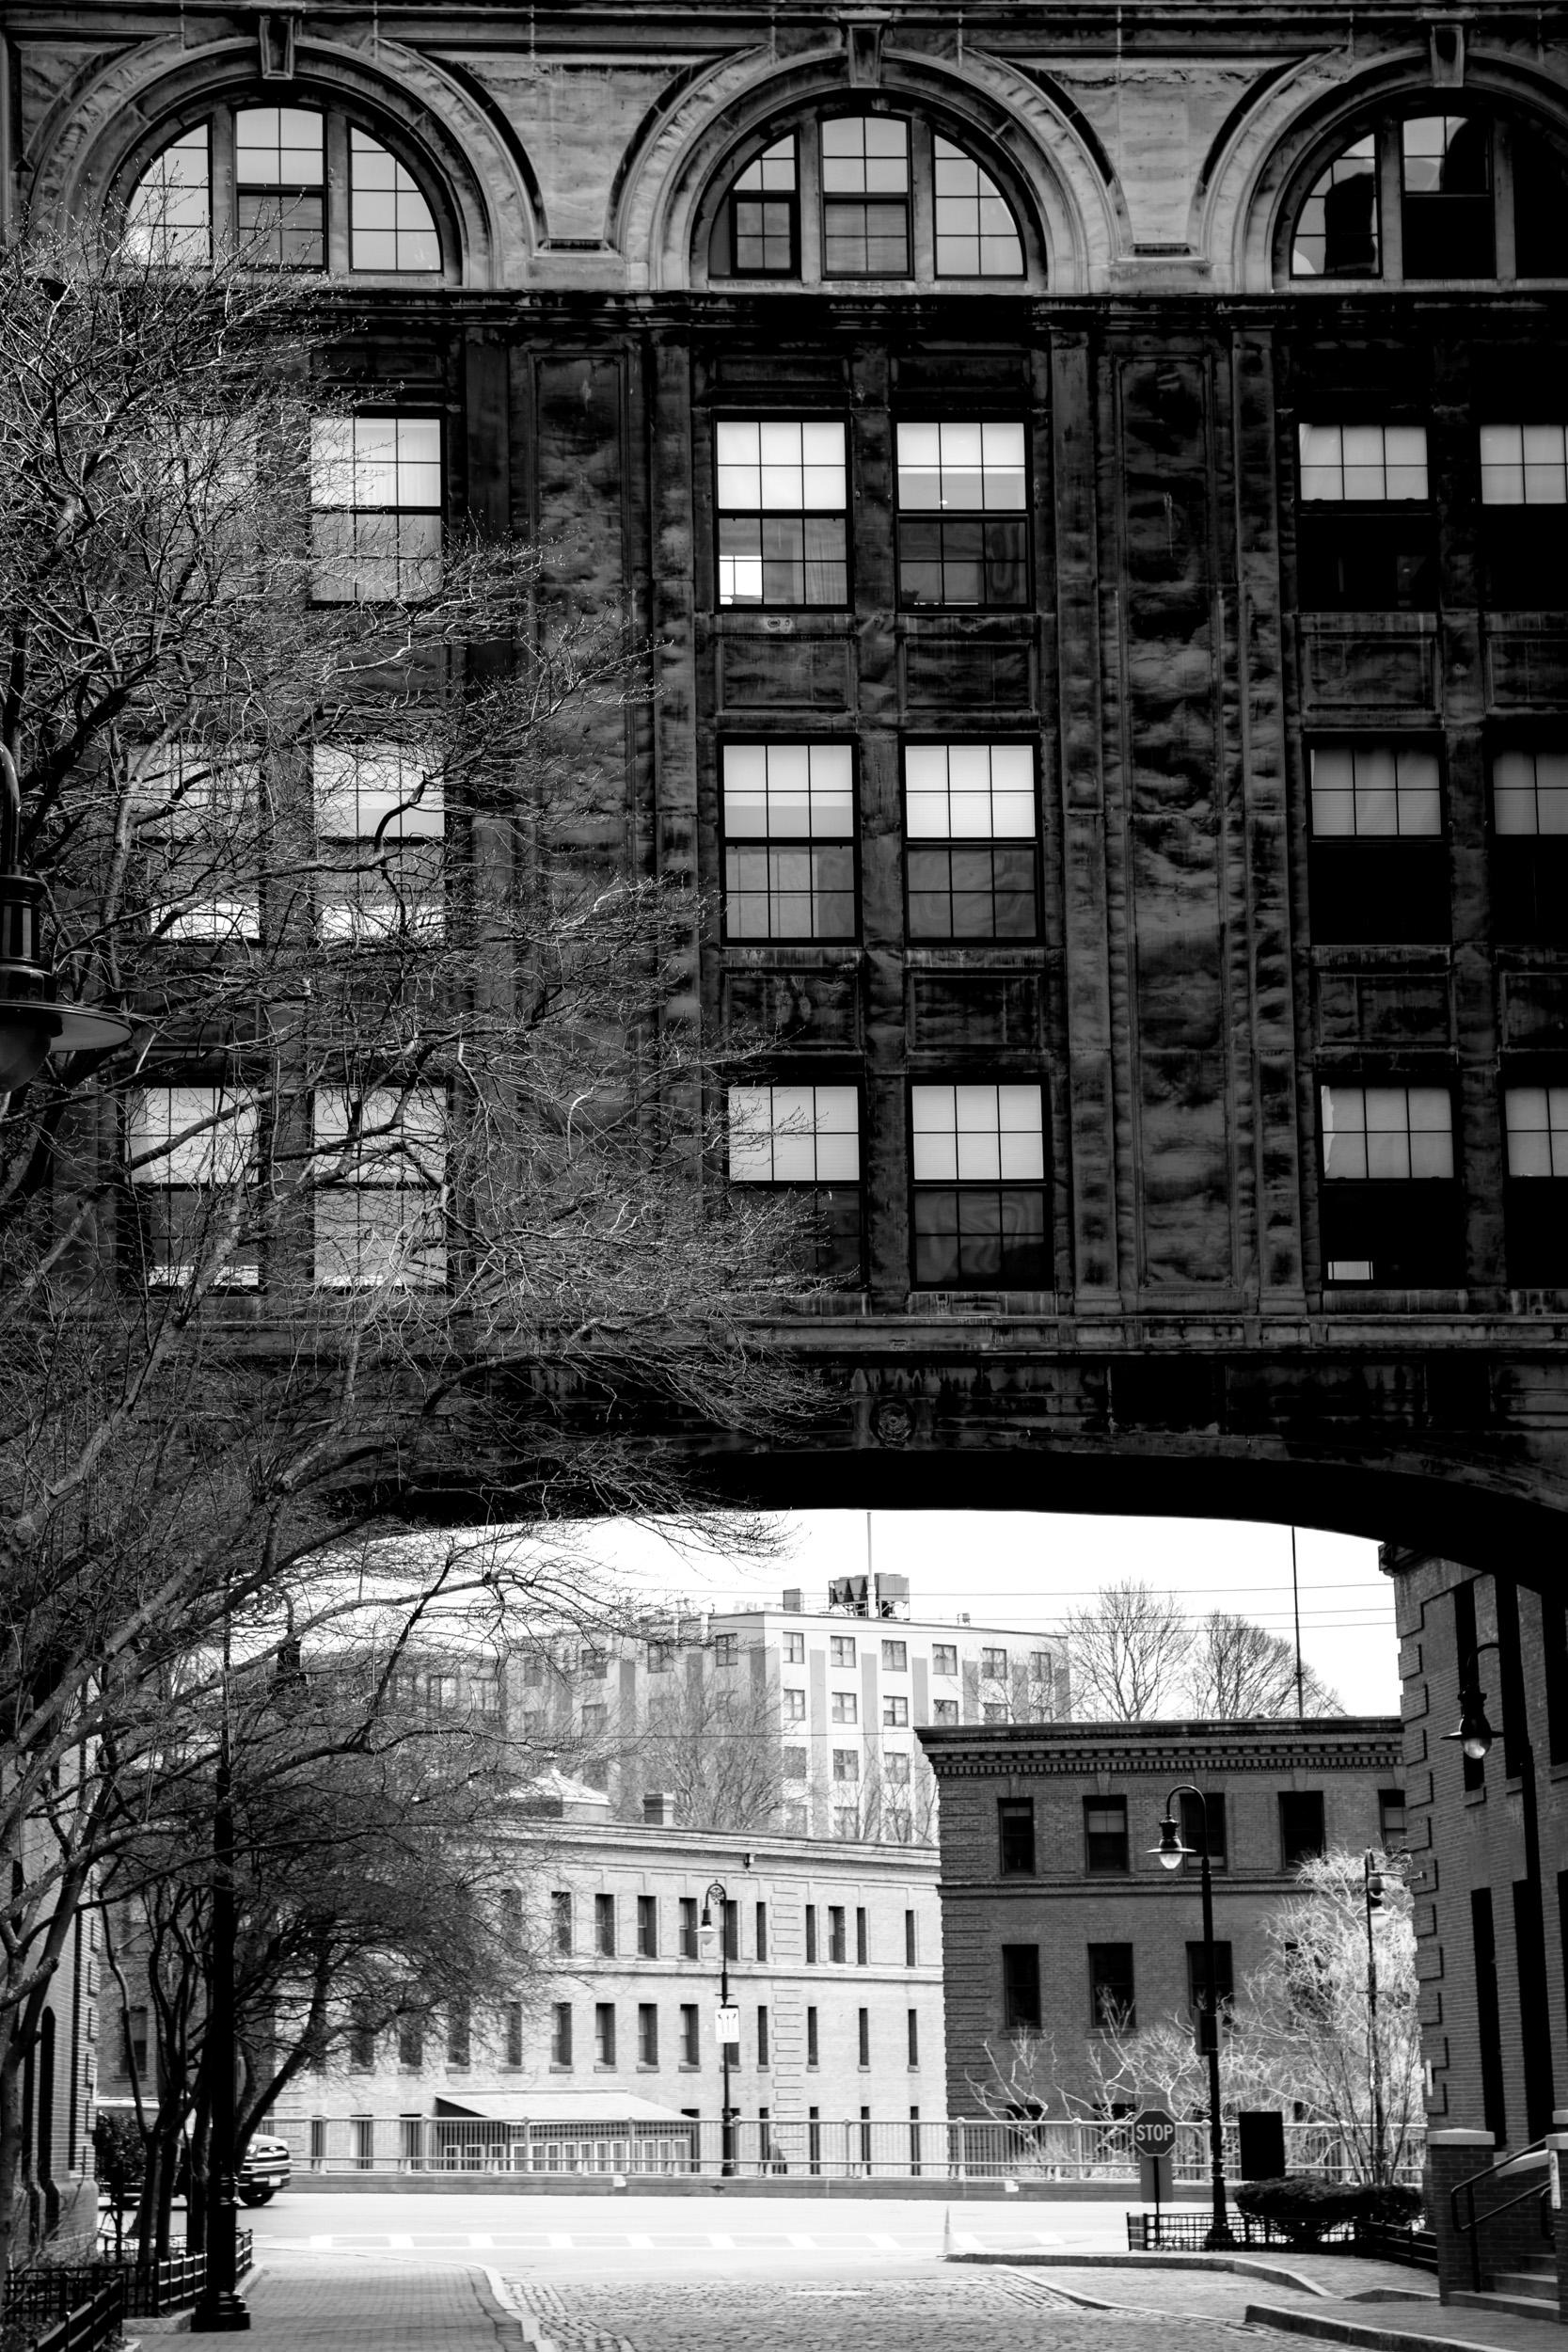 Baker Chocolate Factory - Milton, MA